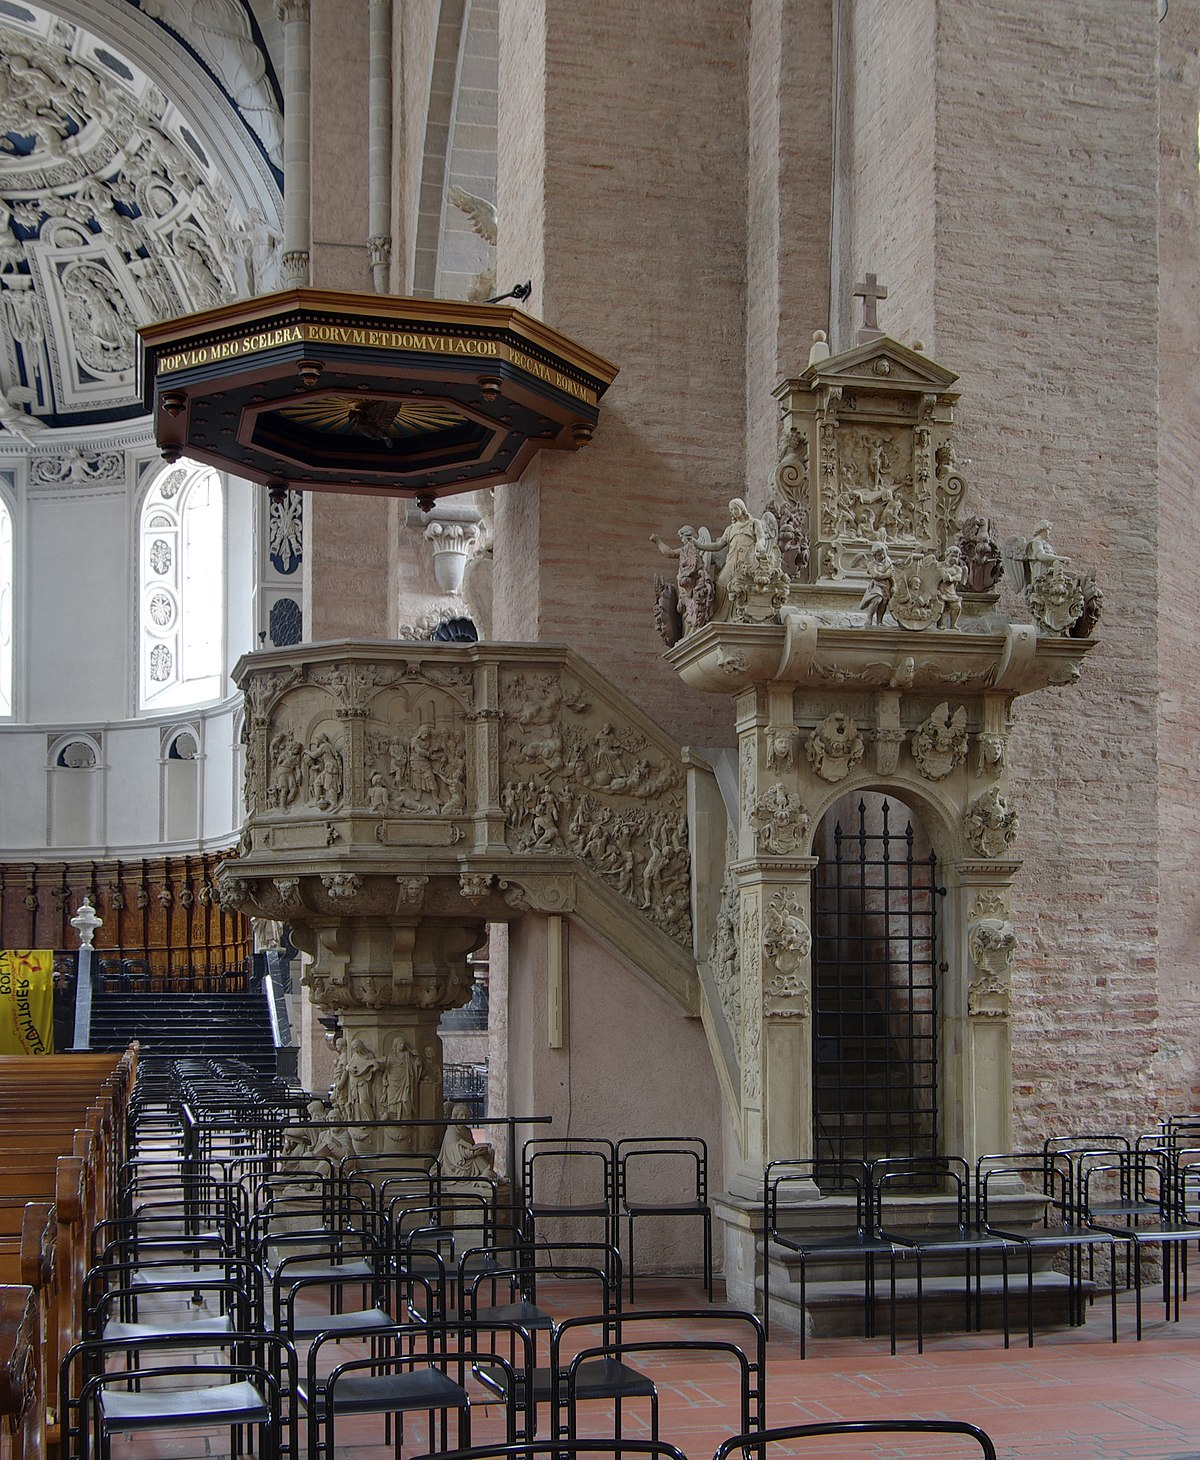 Liste der Trierer Domprediger – Wikipedia